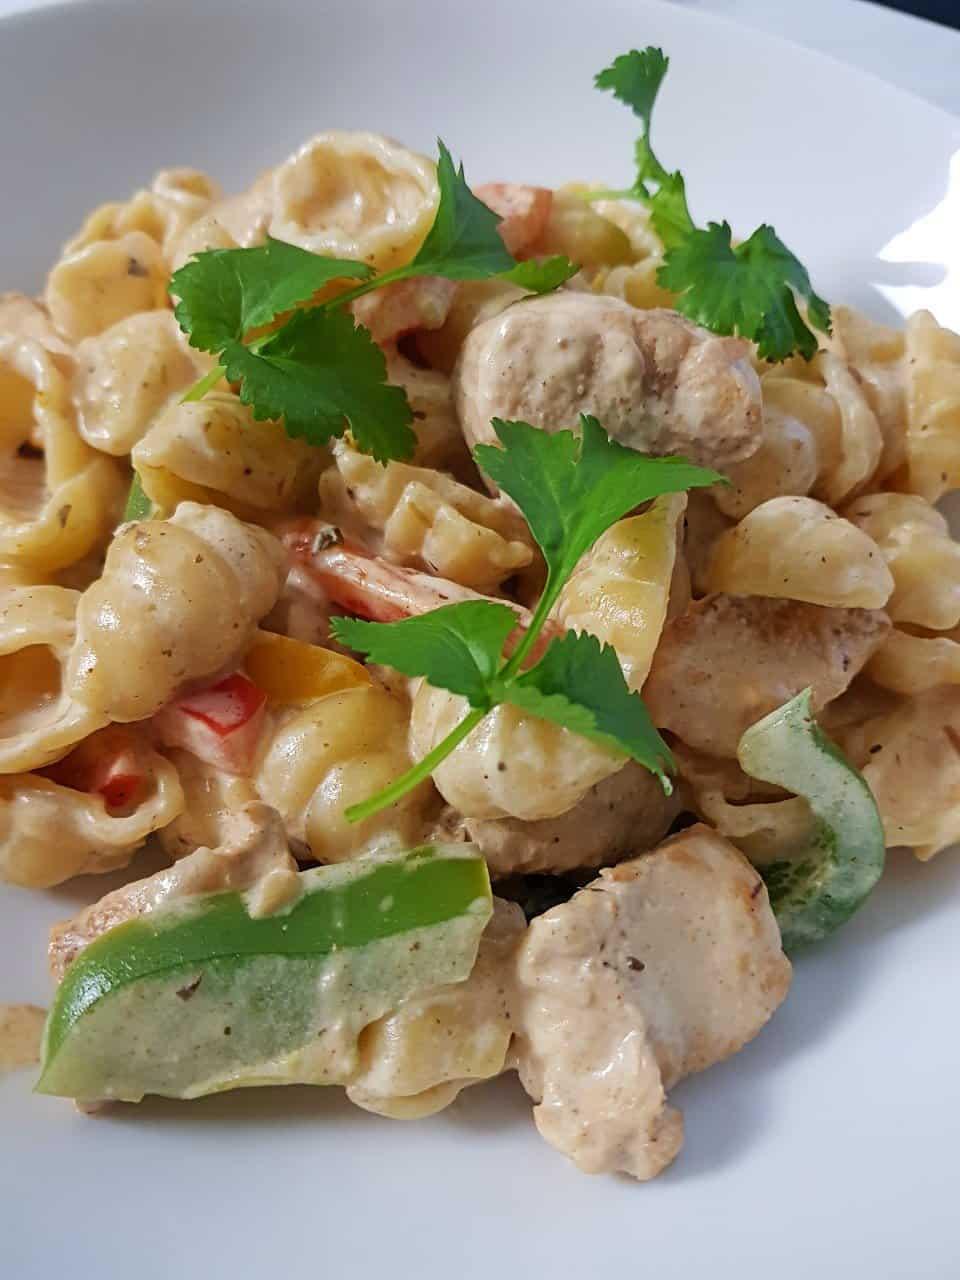 Fajita pasta on a plate.